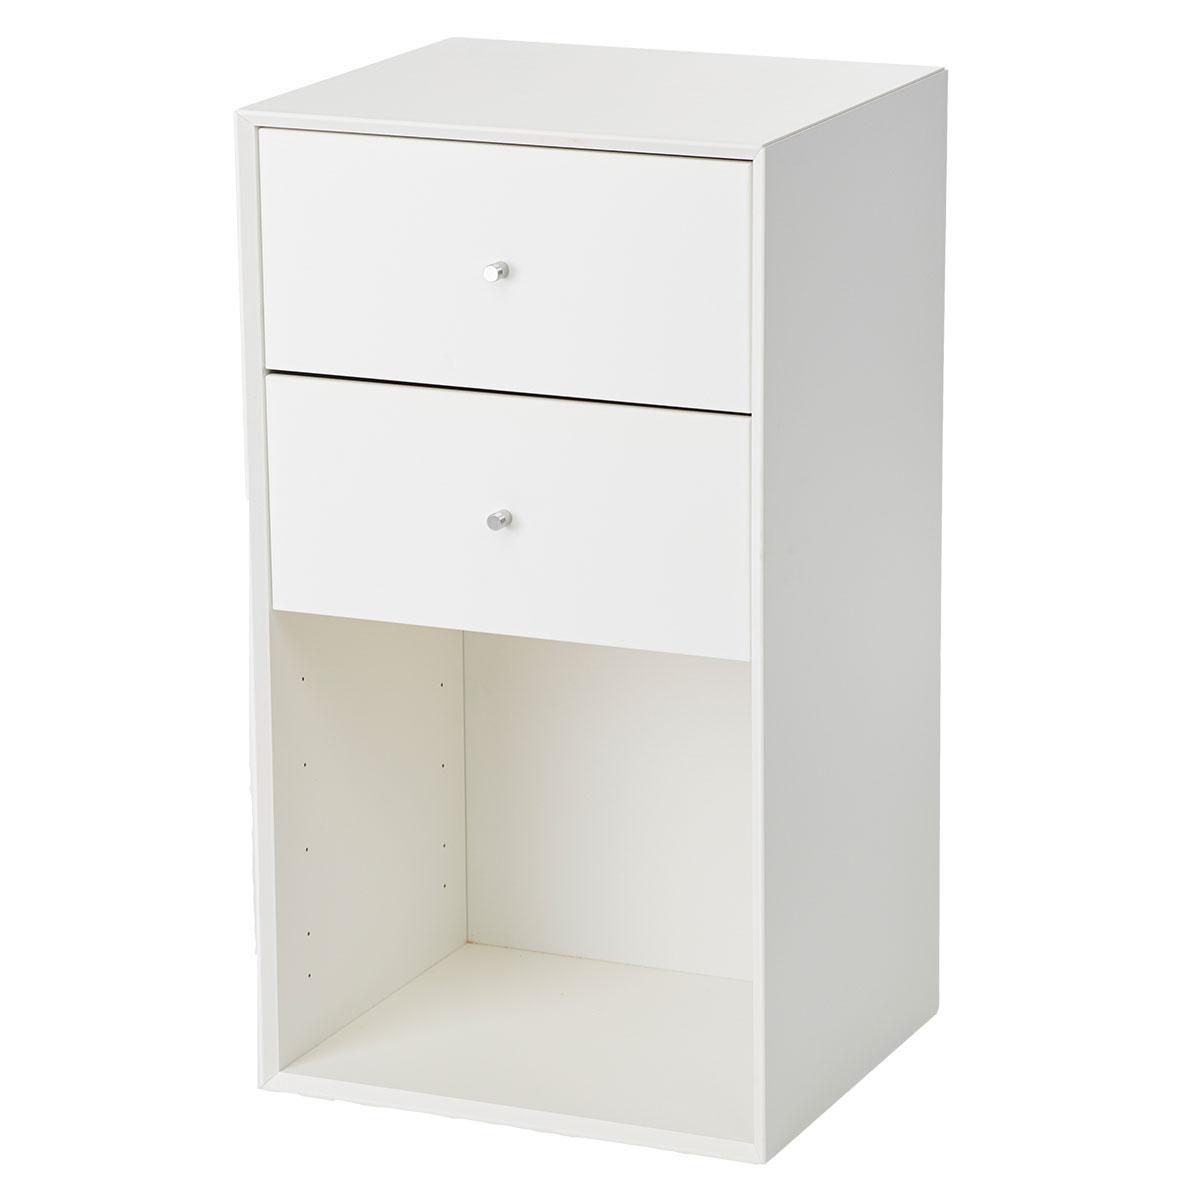 Image of   Living&more reol med skuffer - The Box - 71,2 x 39,4 x 34 cm - Hvid